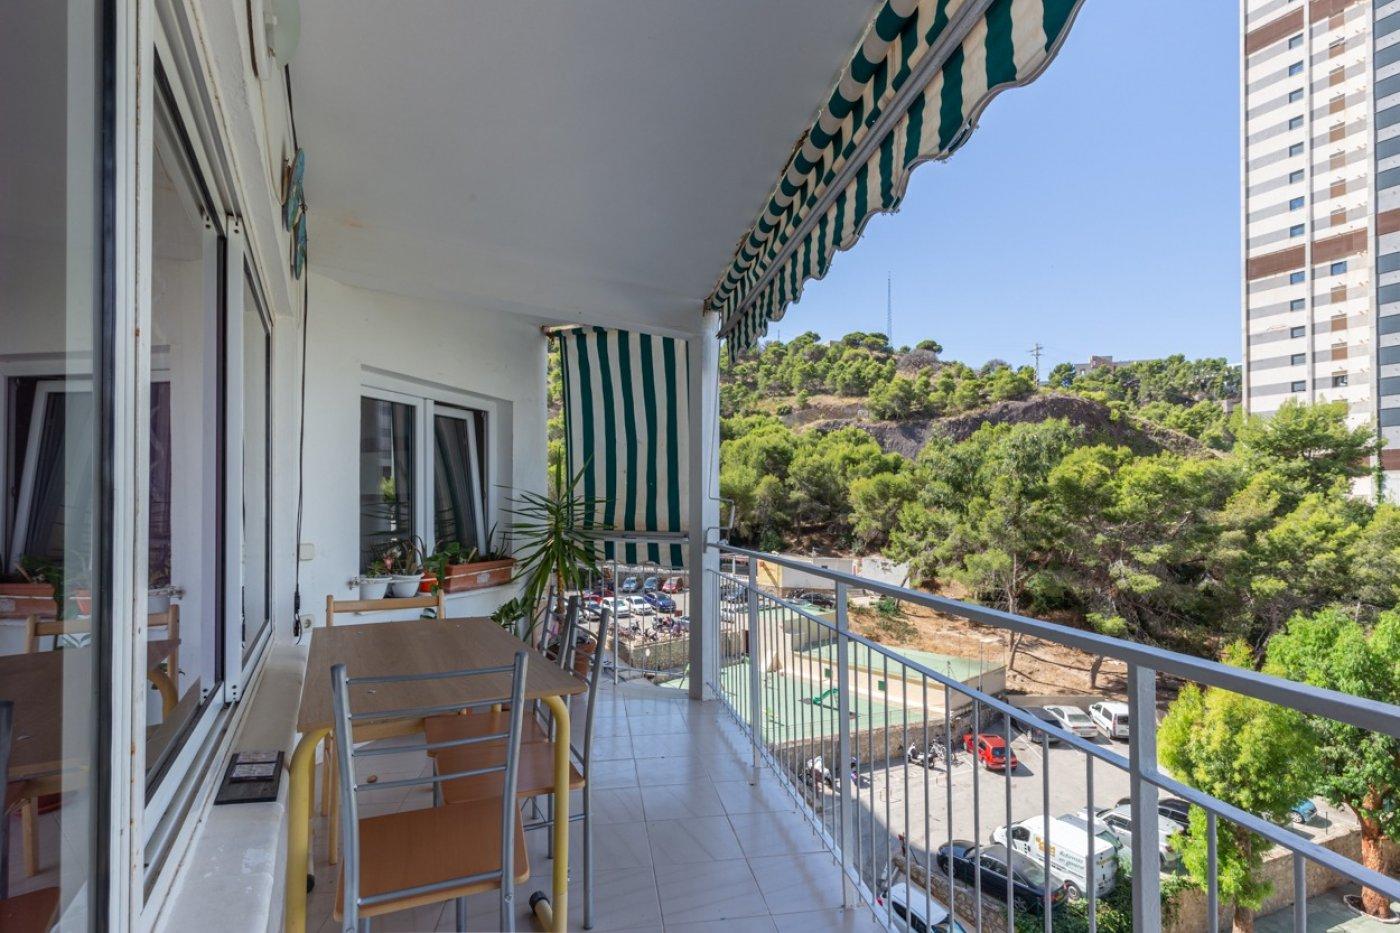 Apartamento en Benidorm zona Rincon de Loix de 65 m²